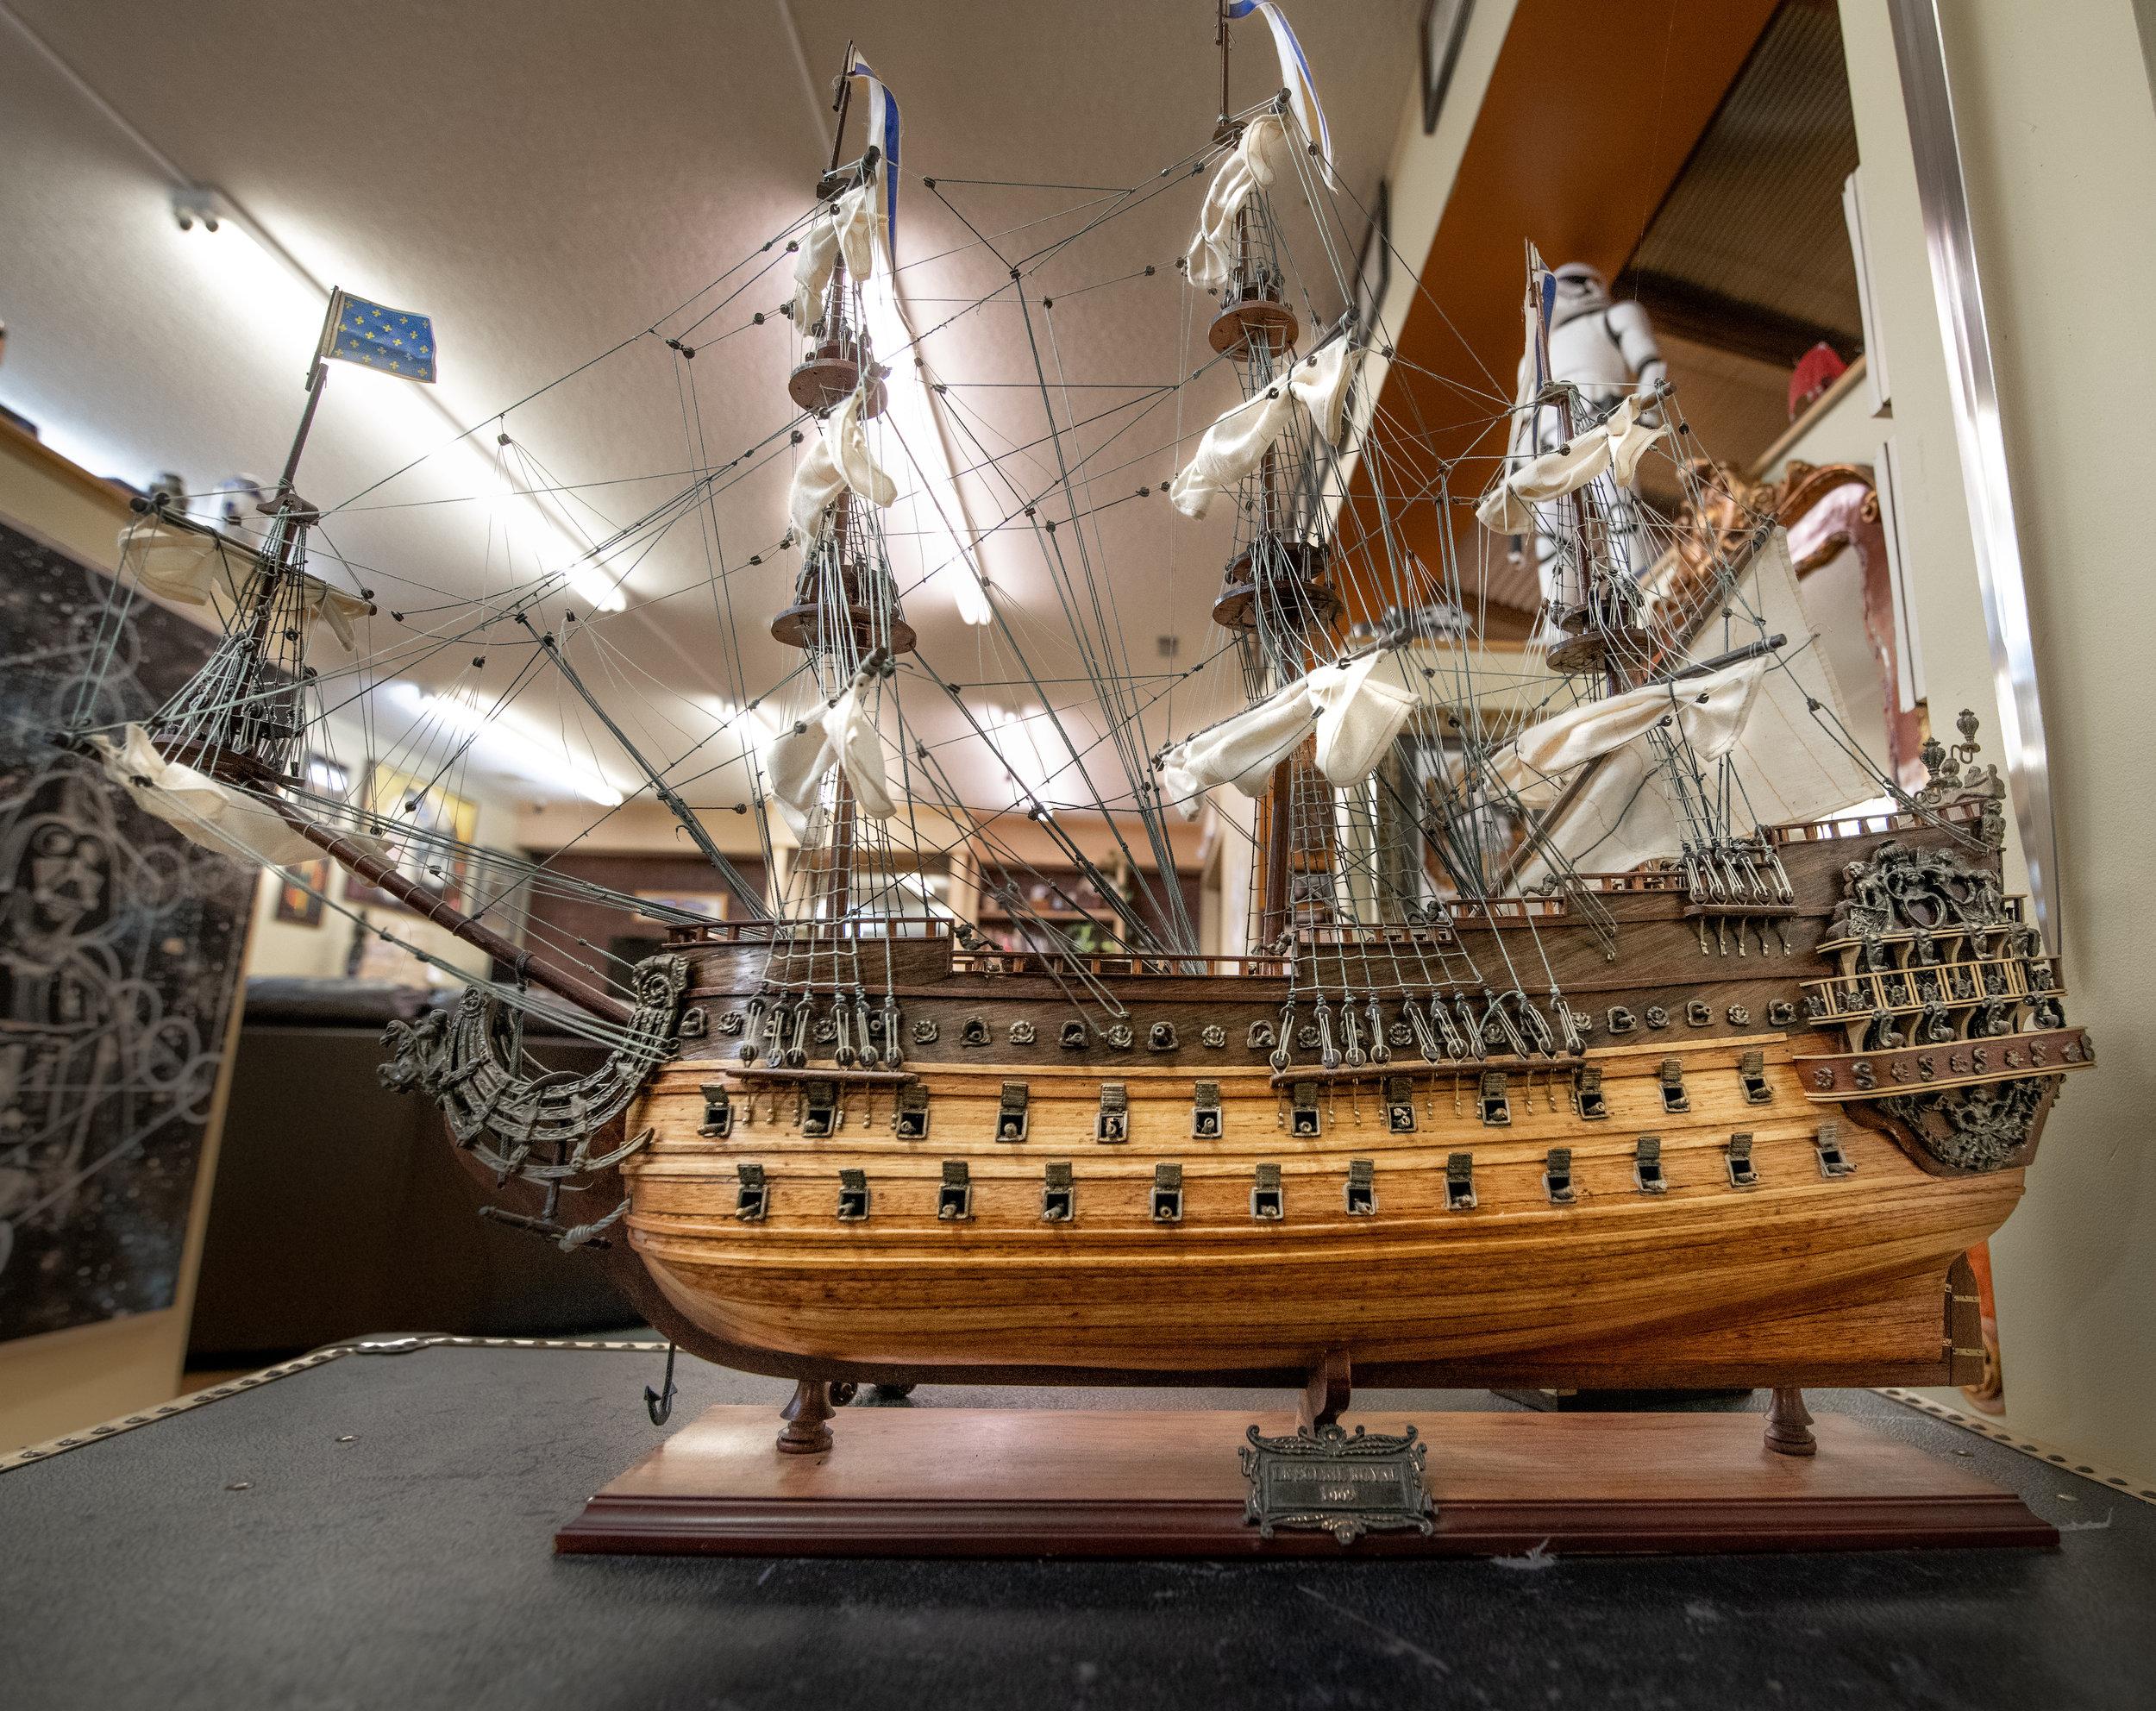 A tall ship replica in James' studio space